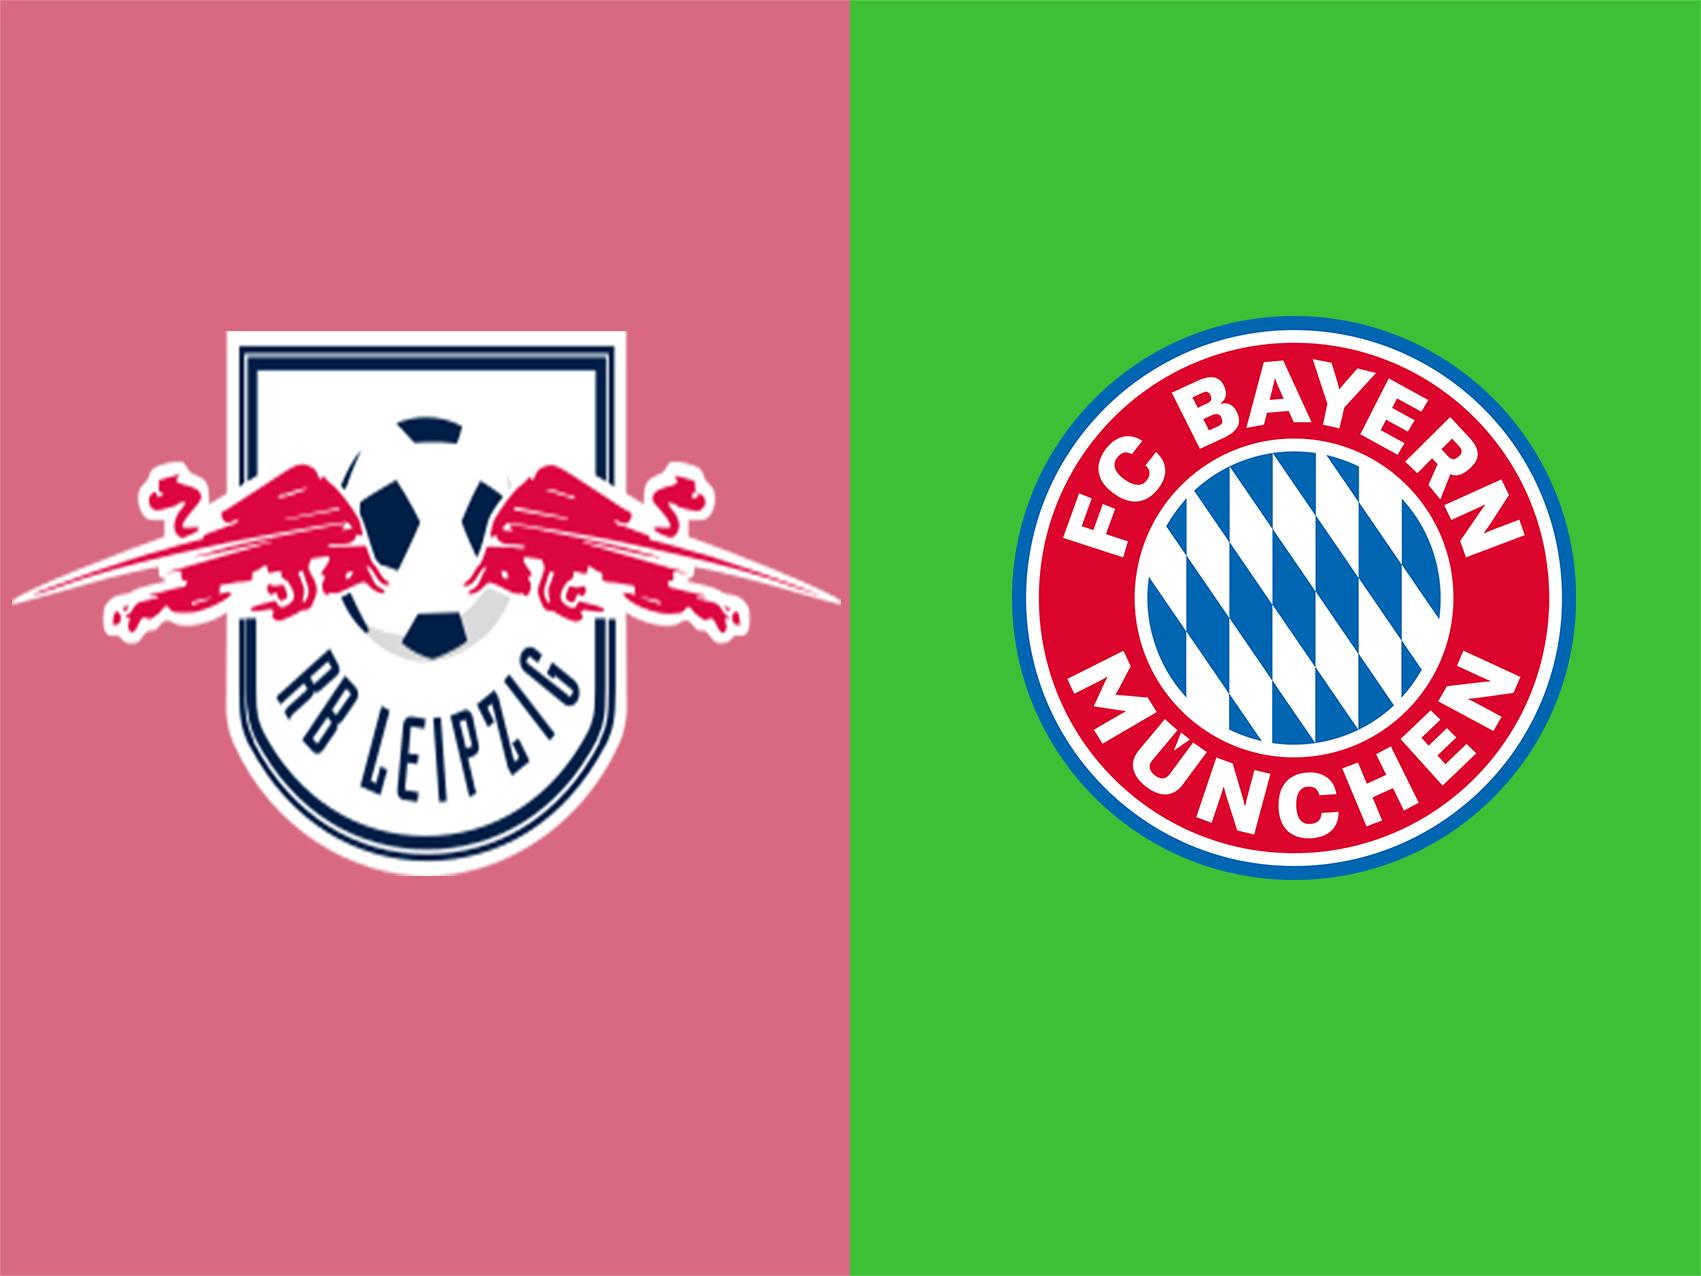 soi-keo-ca-cuoc-bong-da-ngay-14-9-RB Leipzig-vs-Bayern Munich-do-it-thang-do-nhieu-b9